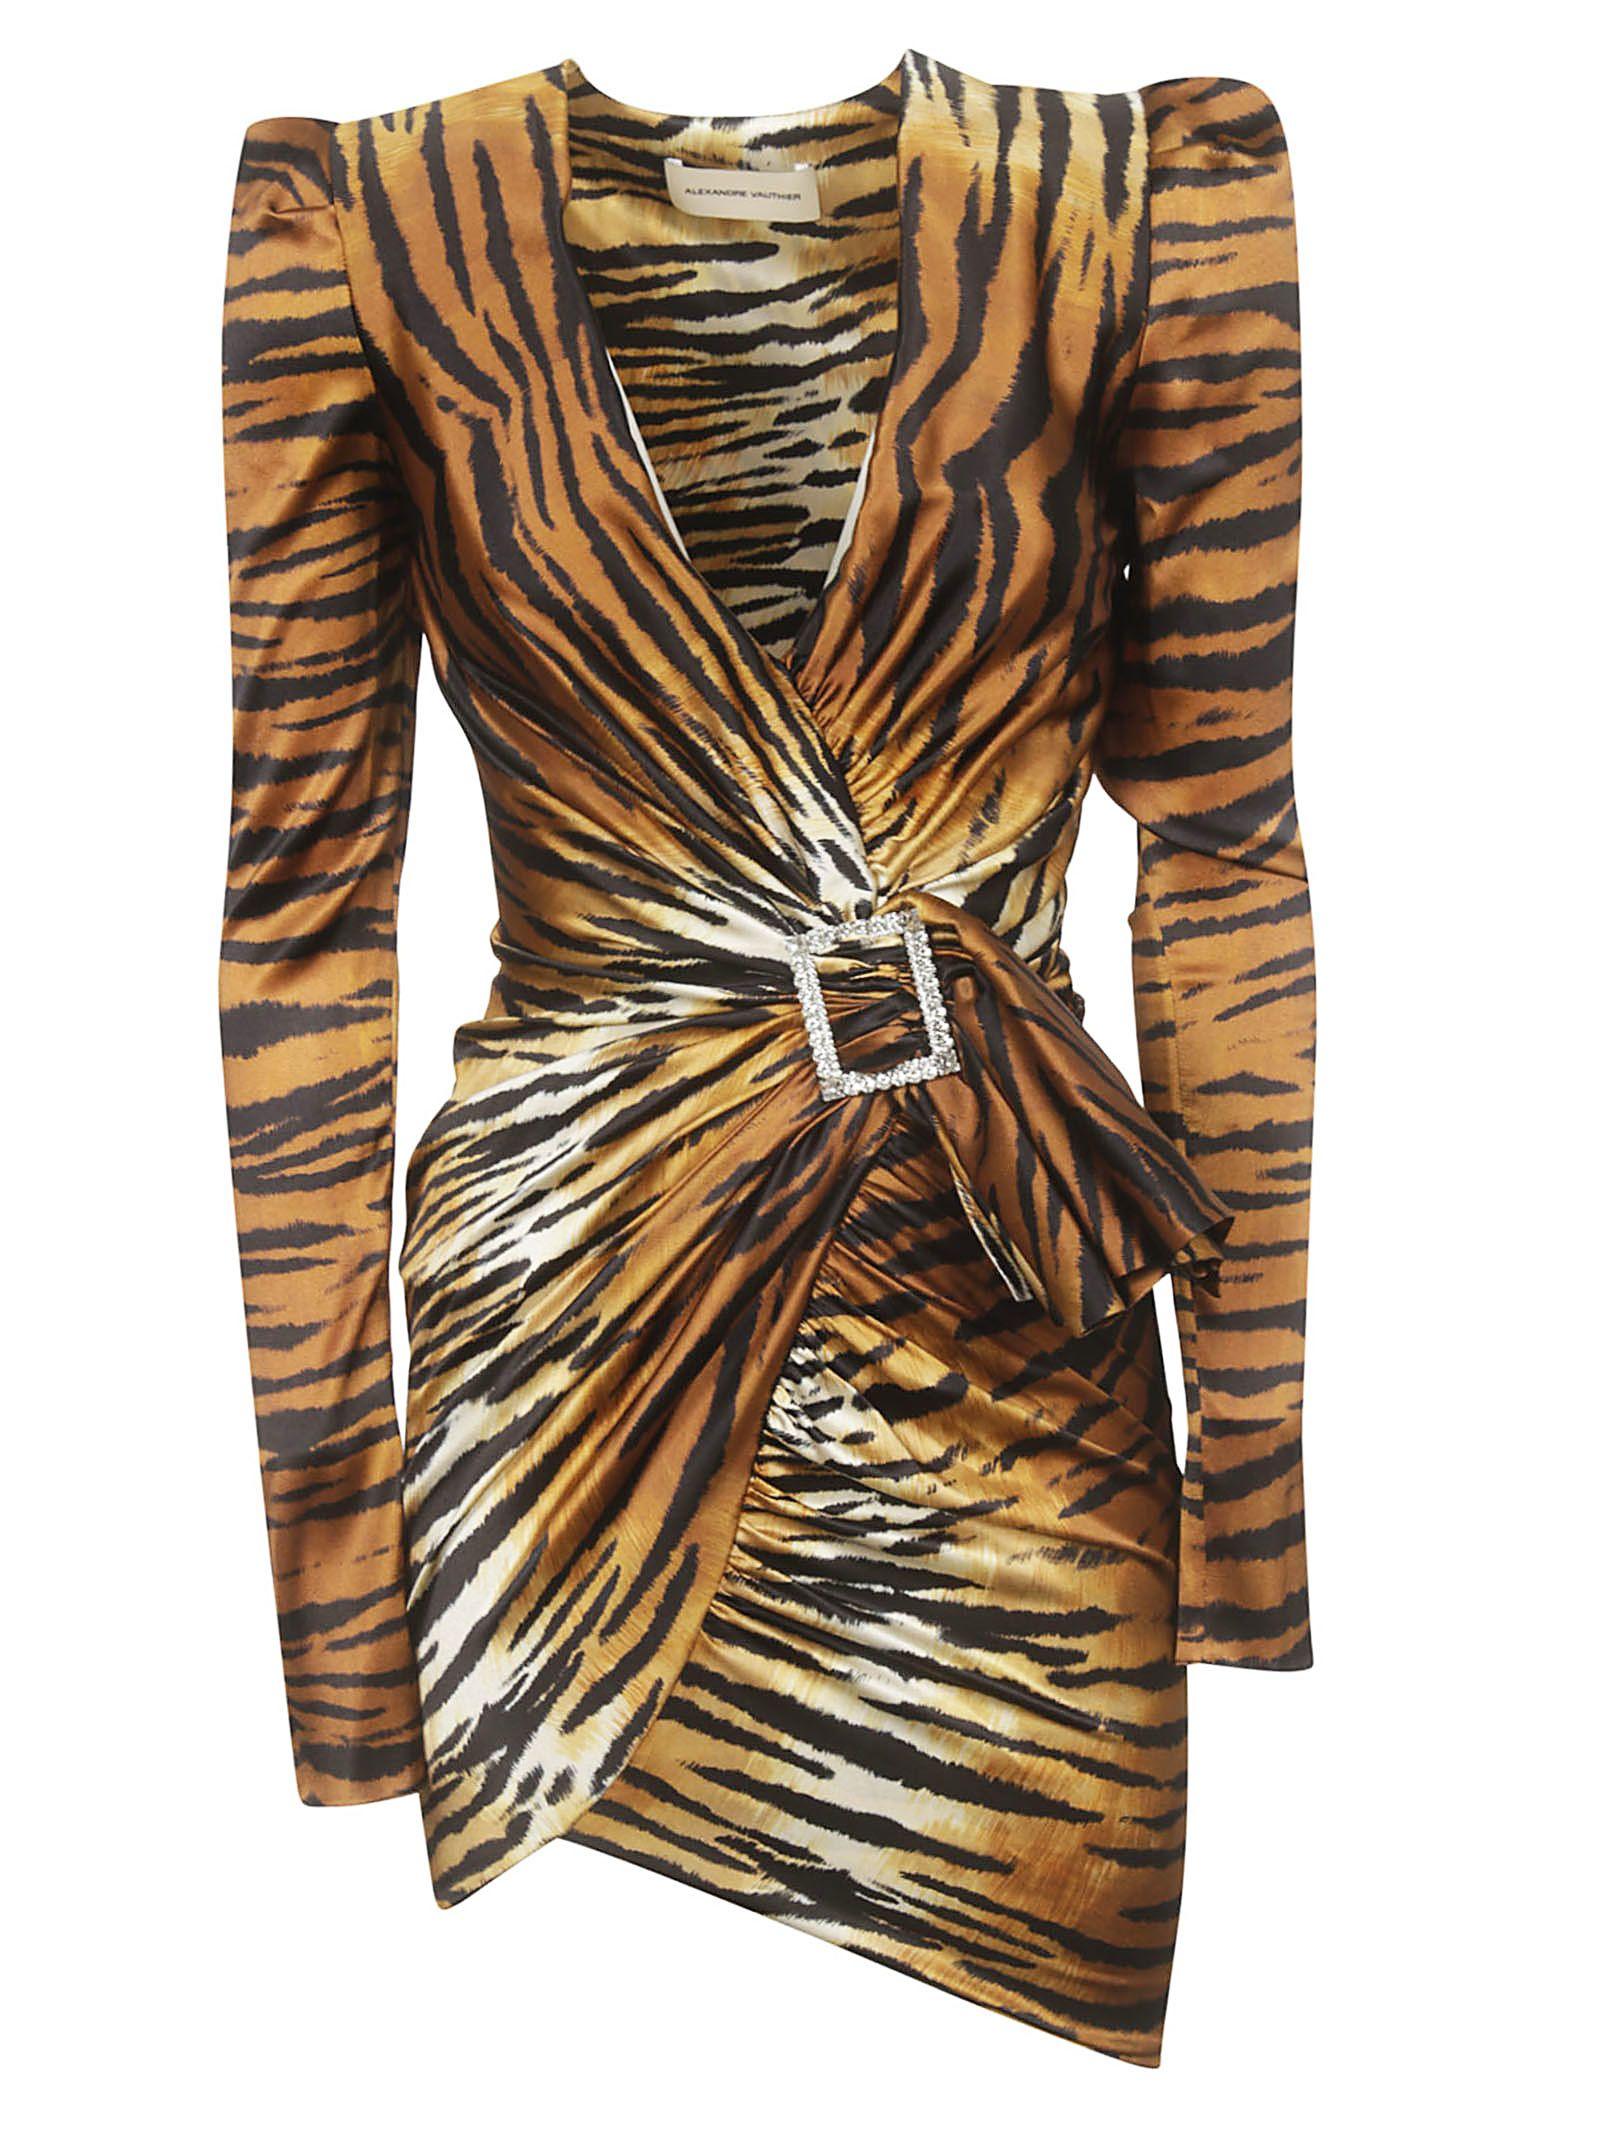 ff98fffa Alexandre Vauthier Alexandre Vauthier Tiger Print Dress - Tiger ...